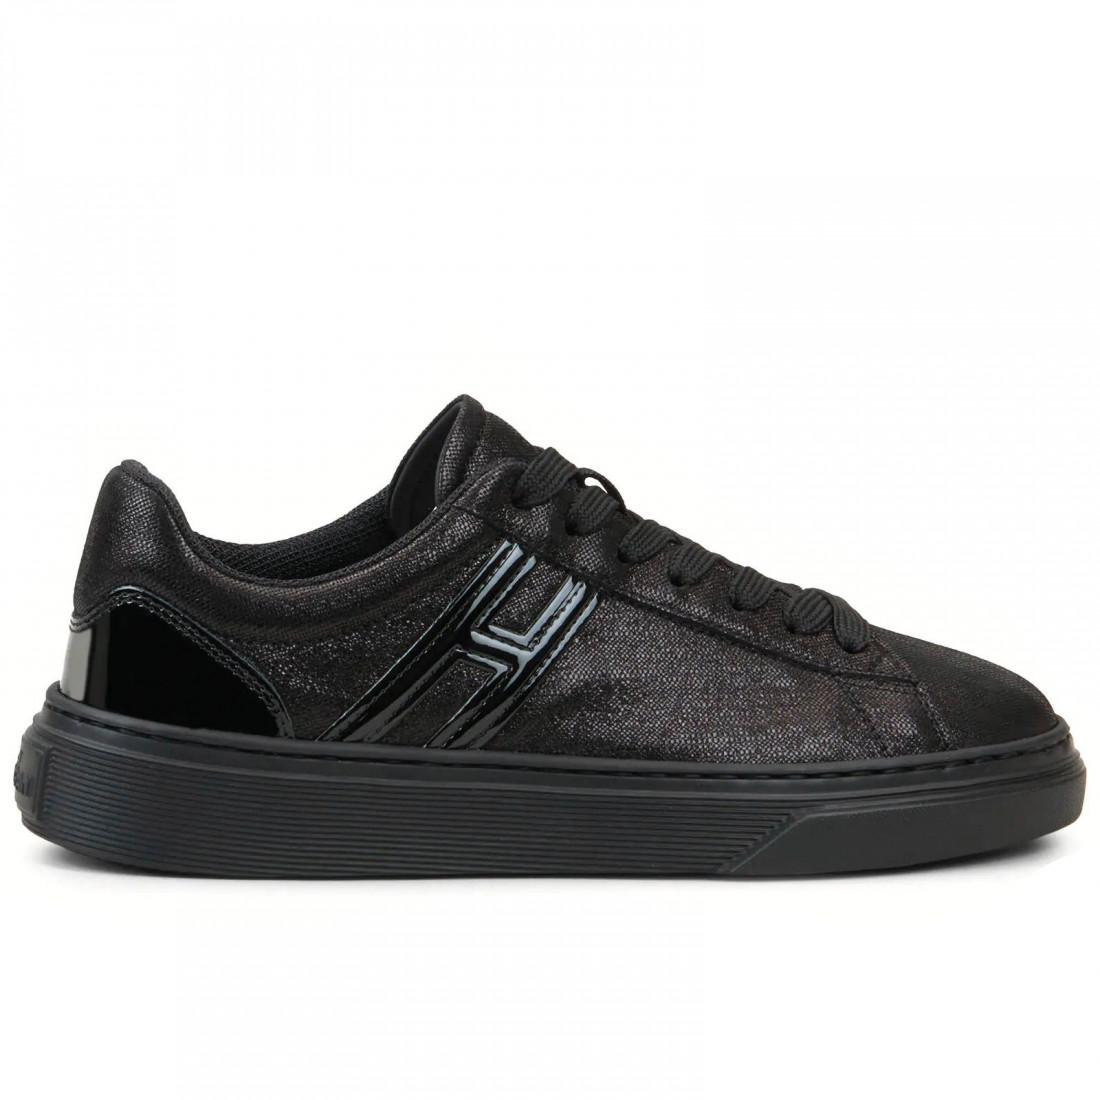 Women's Hogan H365 sneakers in black leather